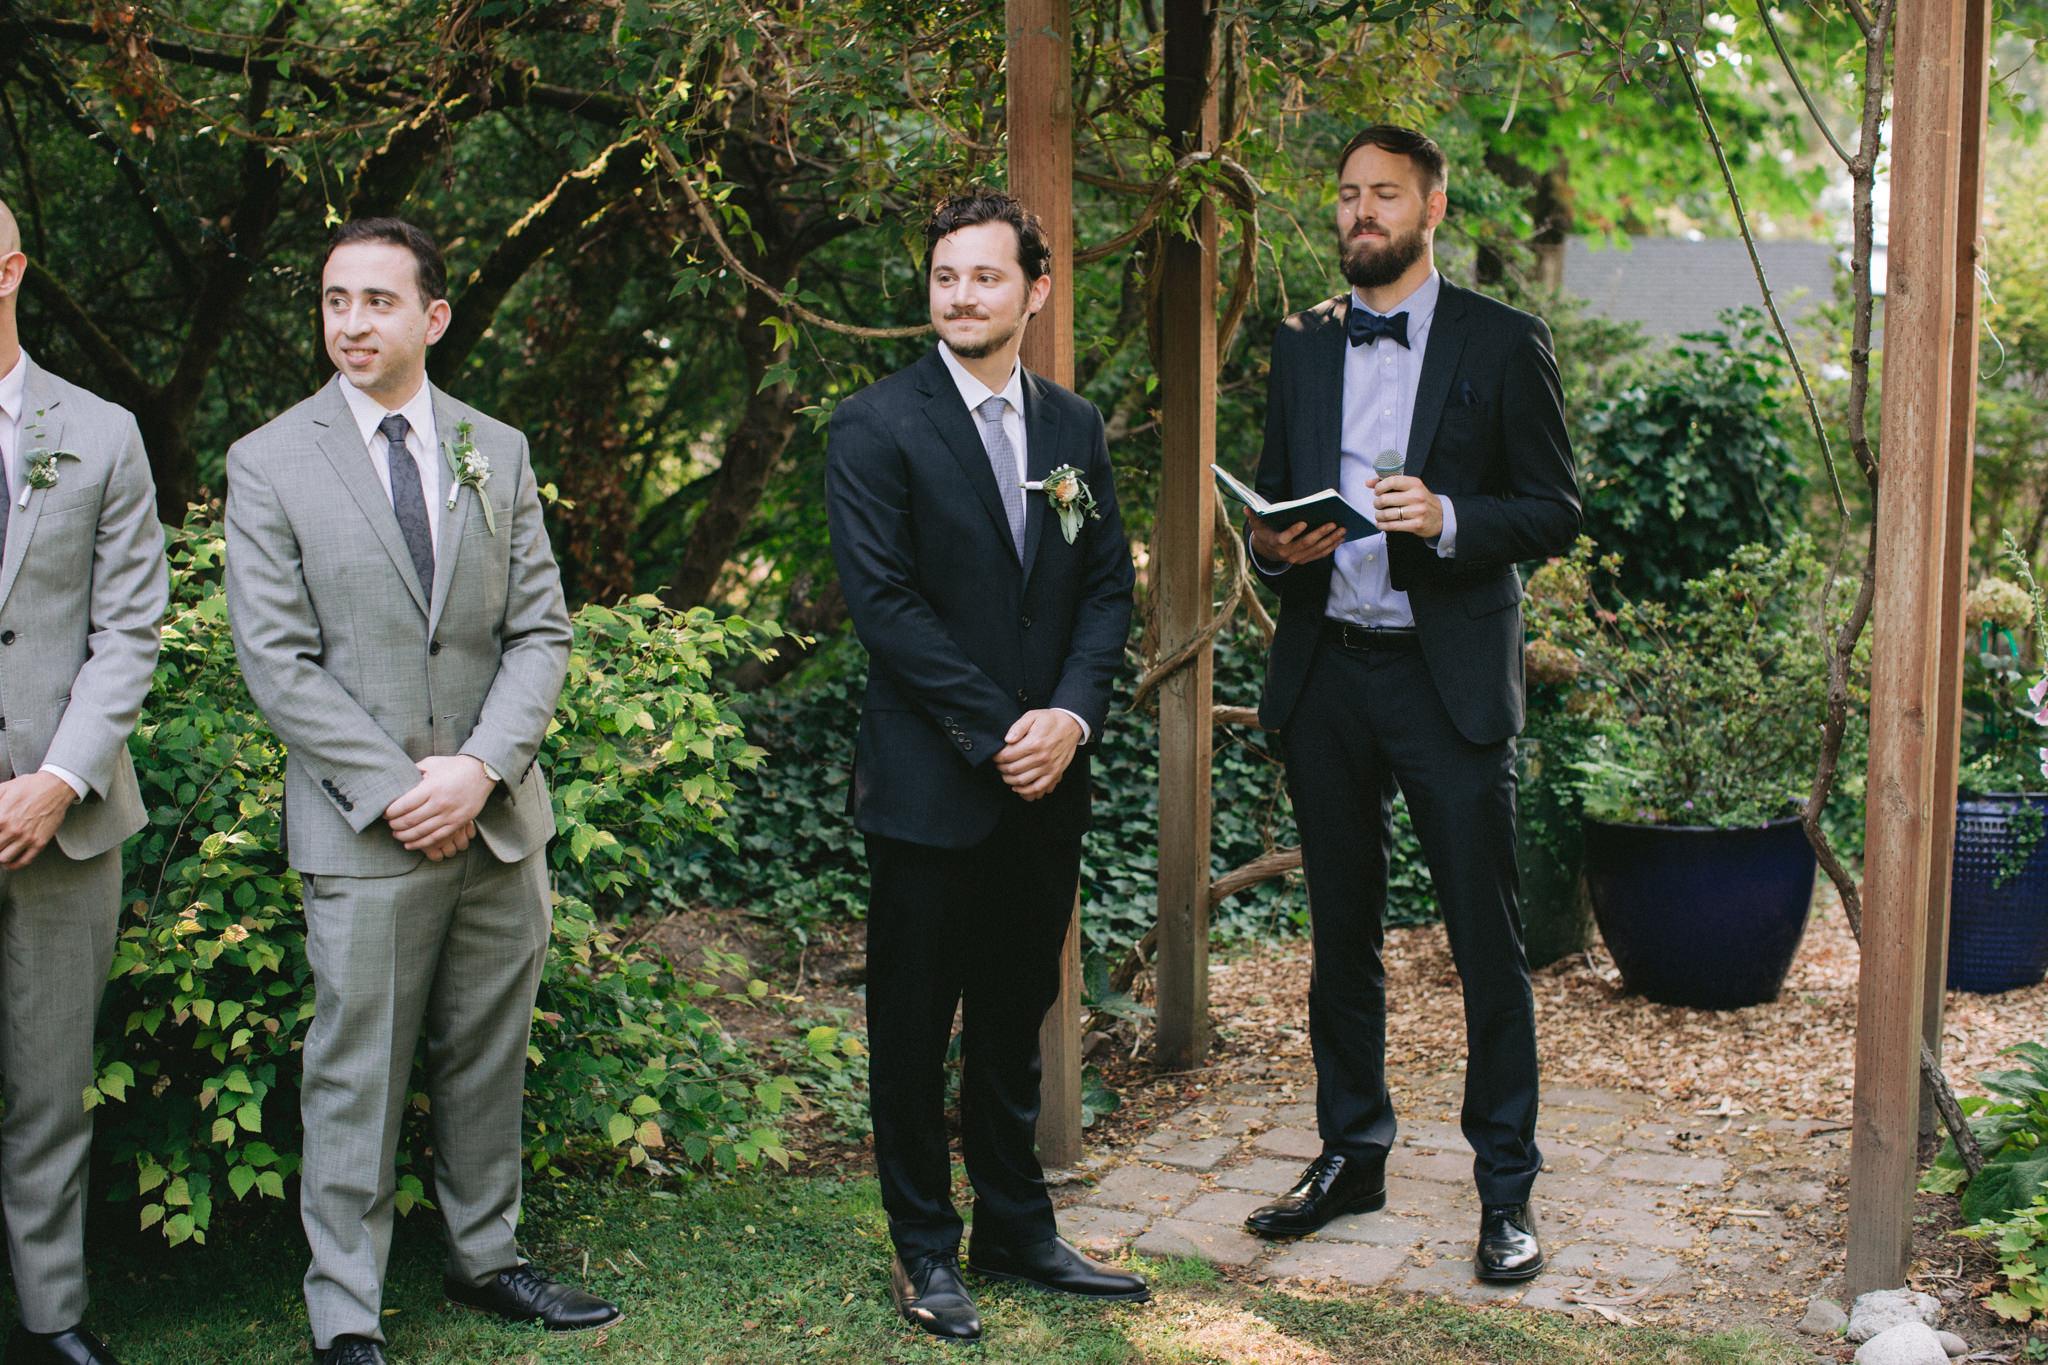 Backyard-Bainbridge-Island-Wedding-Alycia-Lovell-Photography-85.JPG